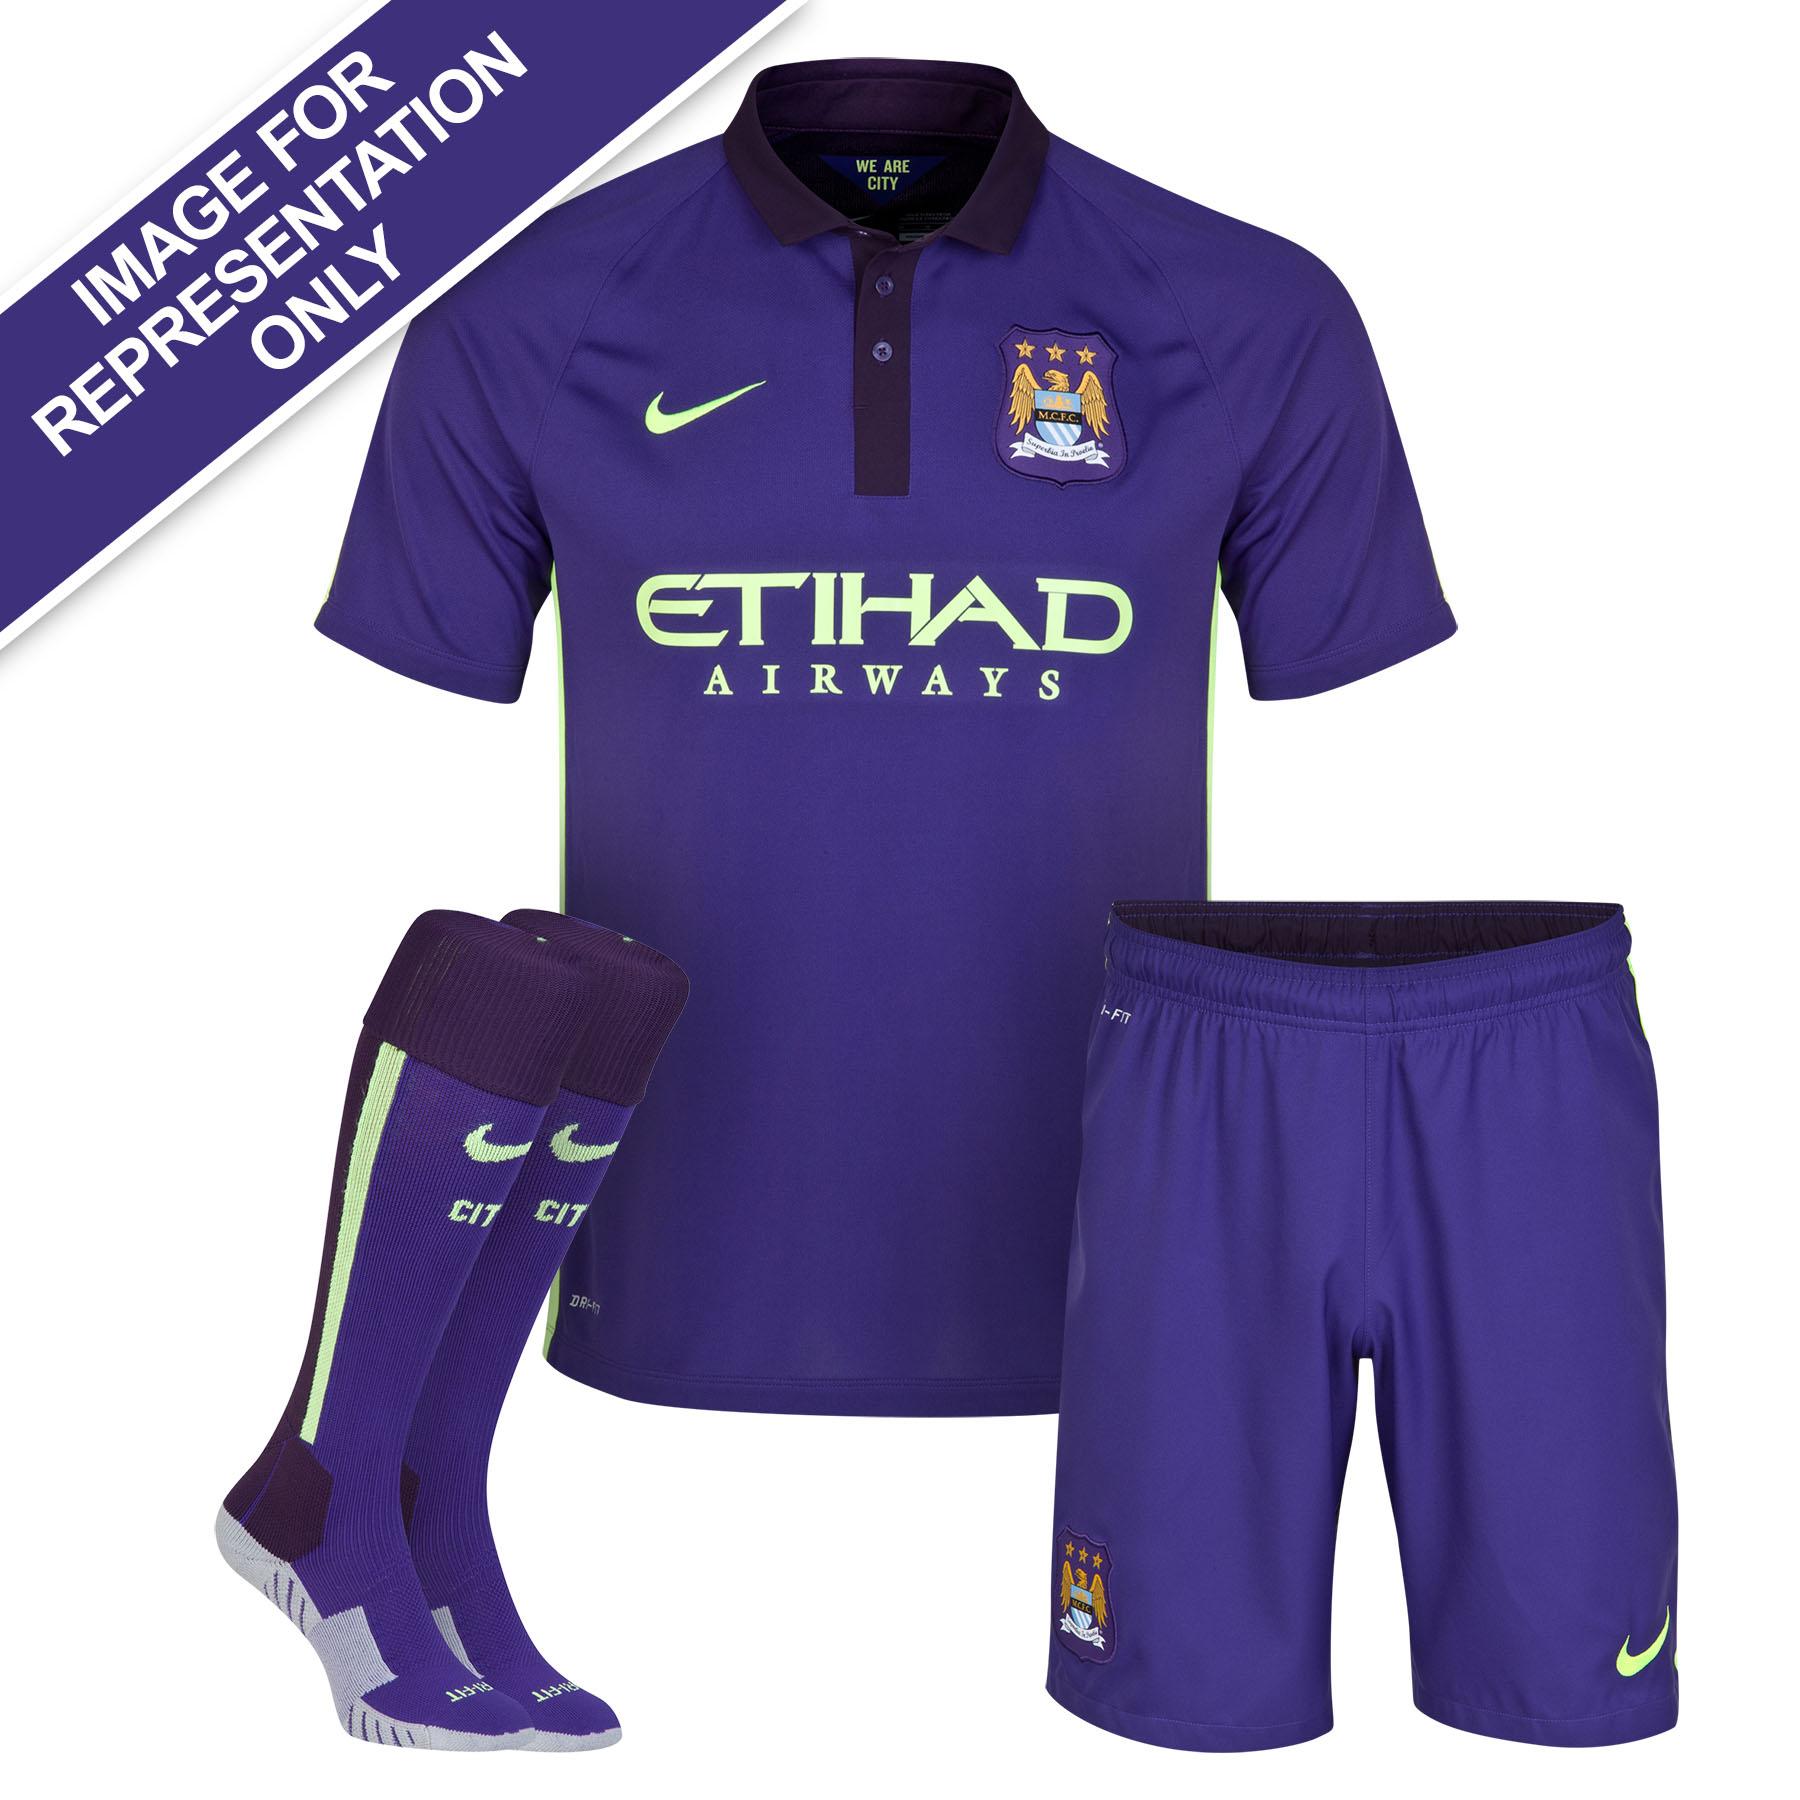 Manchester City Cup Away Kit 2014/15 - Little Boys Purple